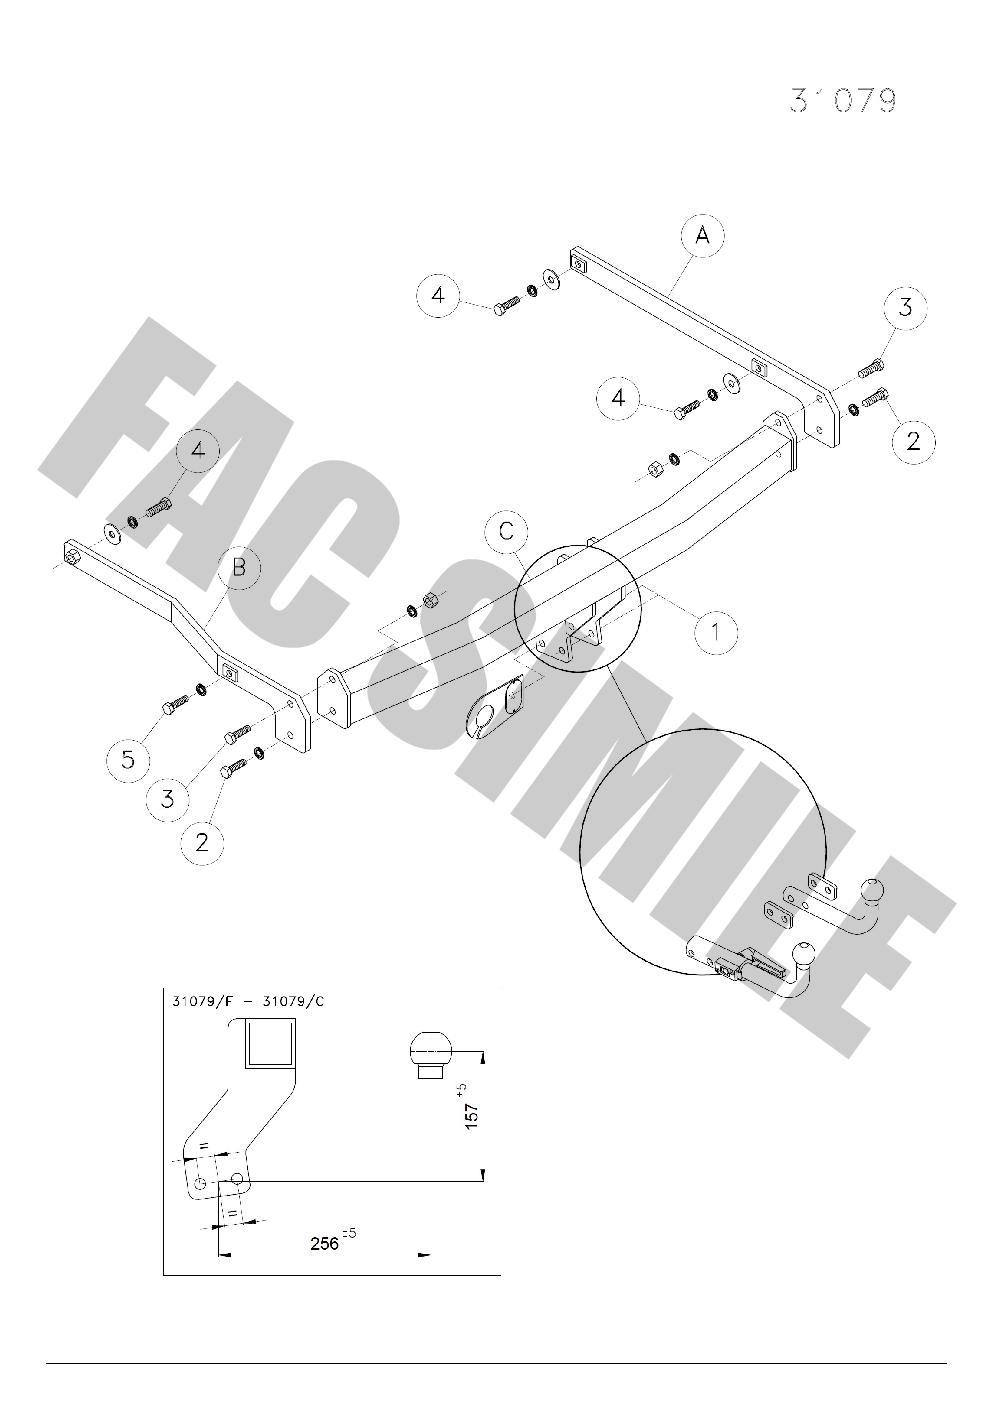 AHK Anhängerkupplung 7p C2 E-Satz Renault Megane 2 Grandtour 03-09 31079/_B2